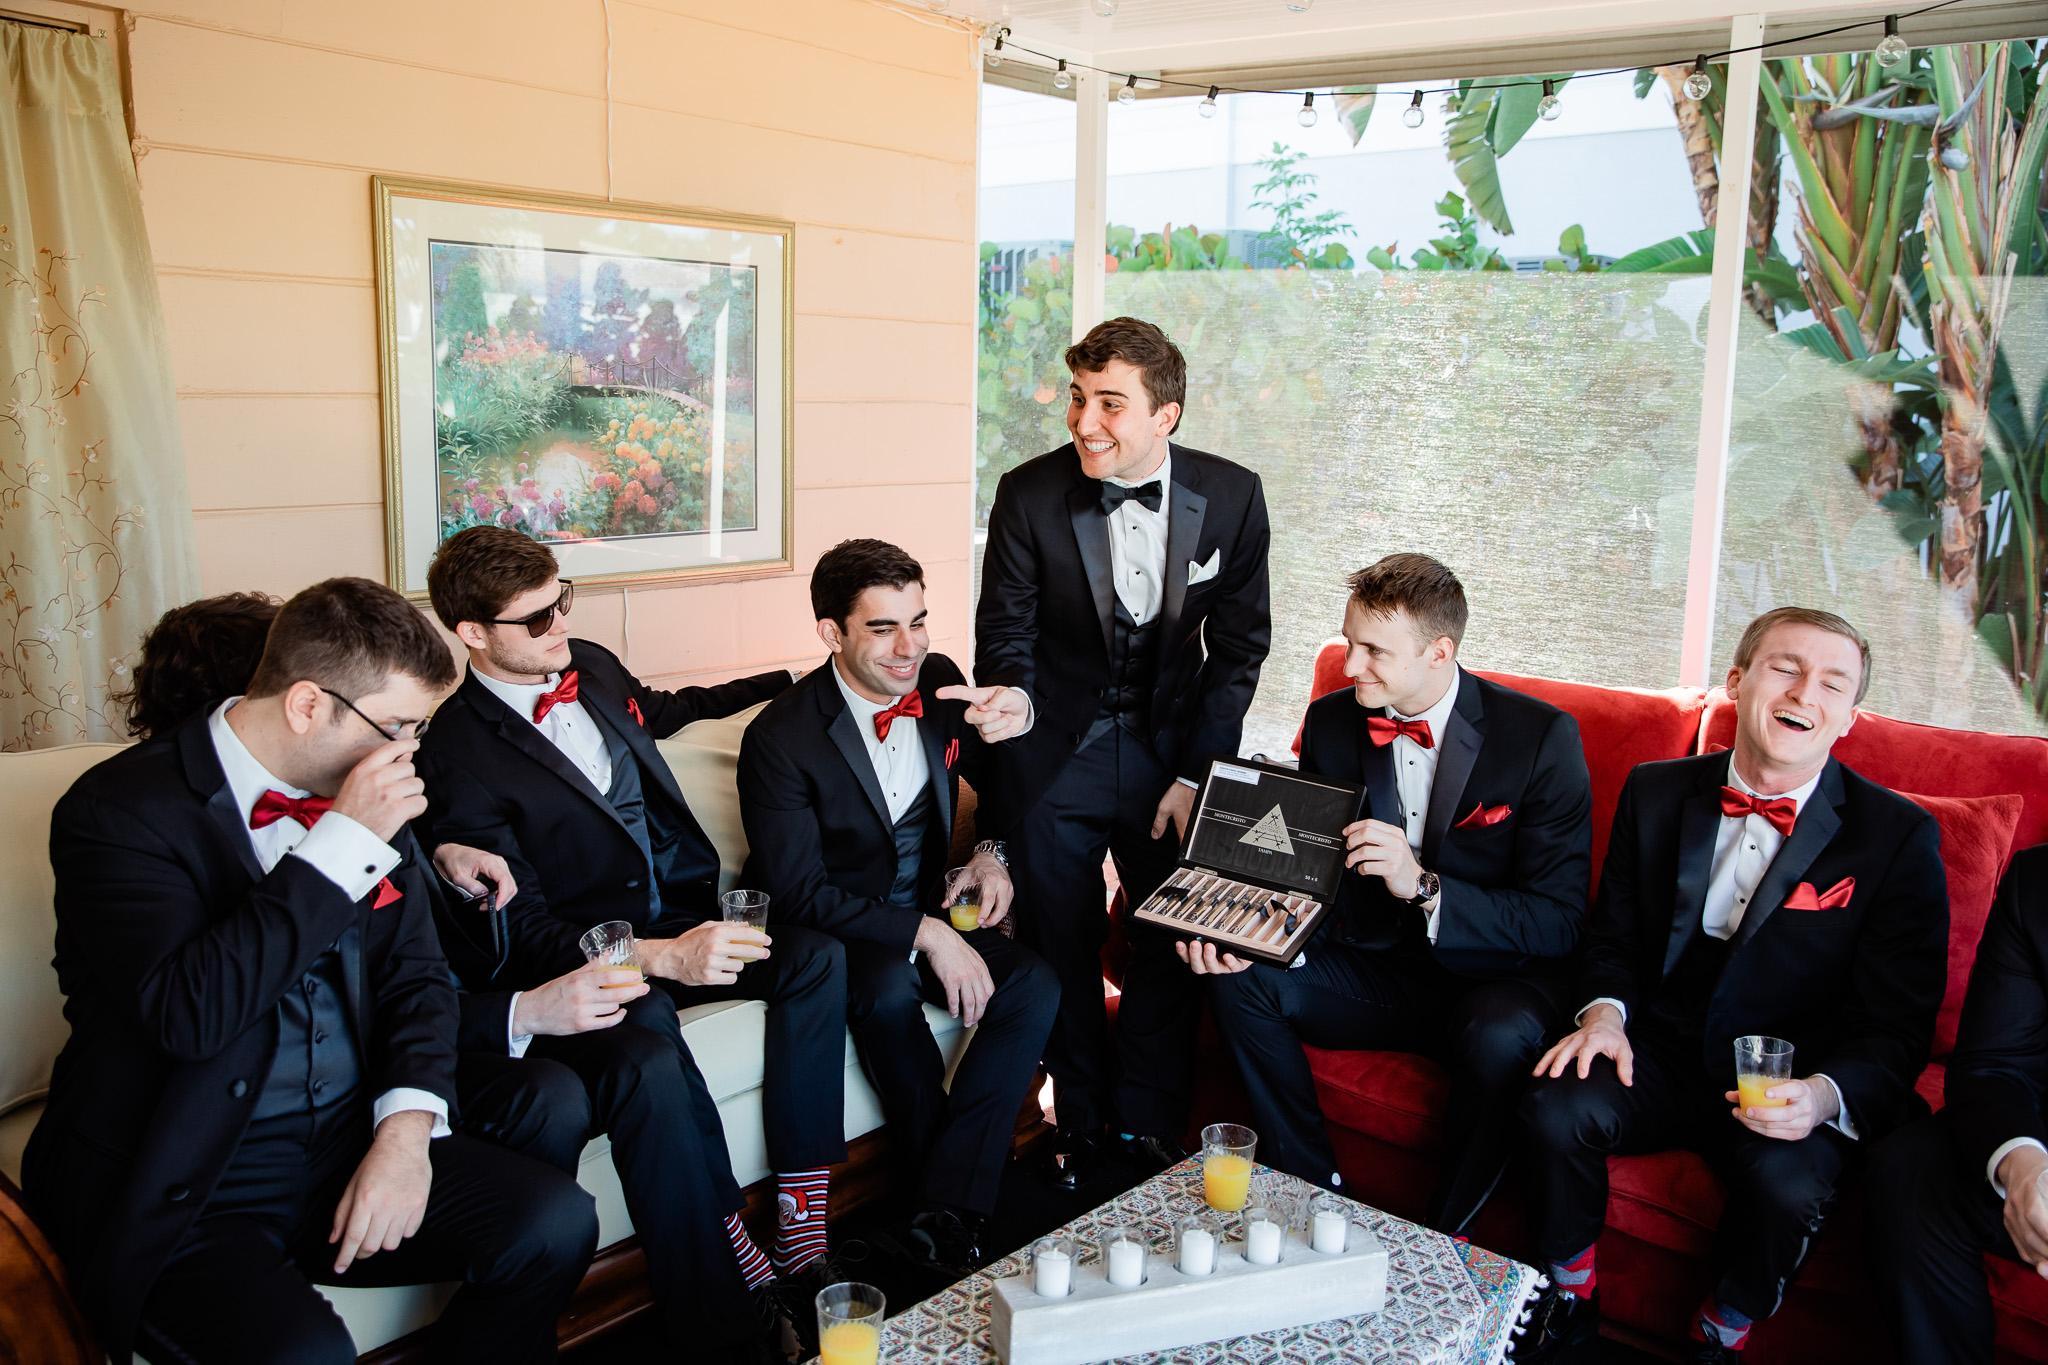 TAMPA_WEDDING_PHOTOGRAPHER_MPMZ_TJP40306_0025.jpg